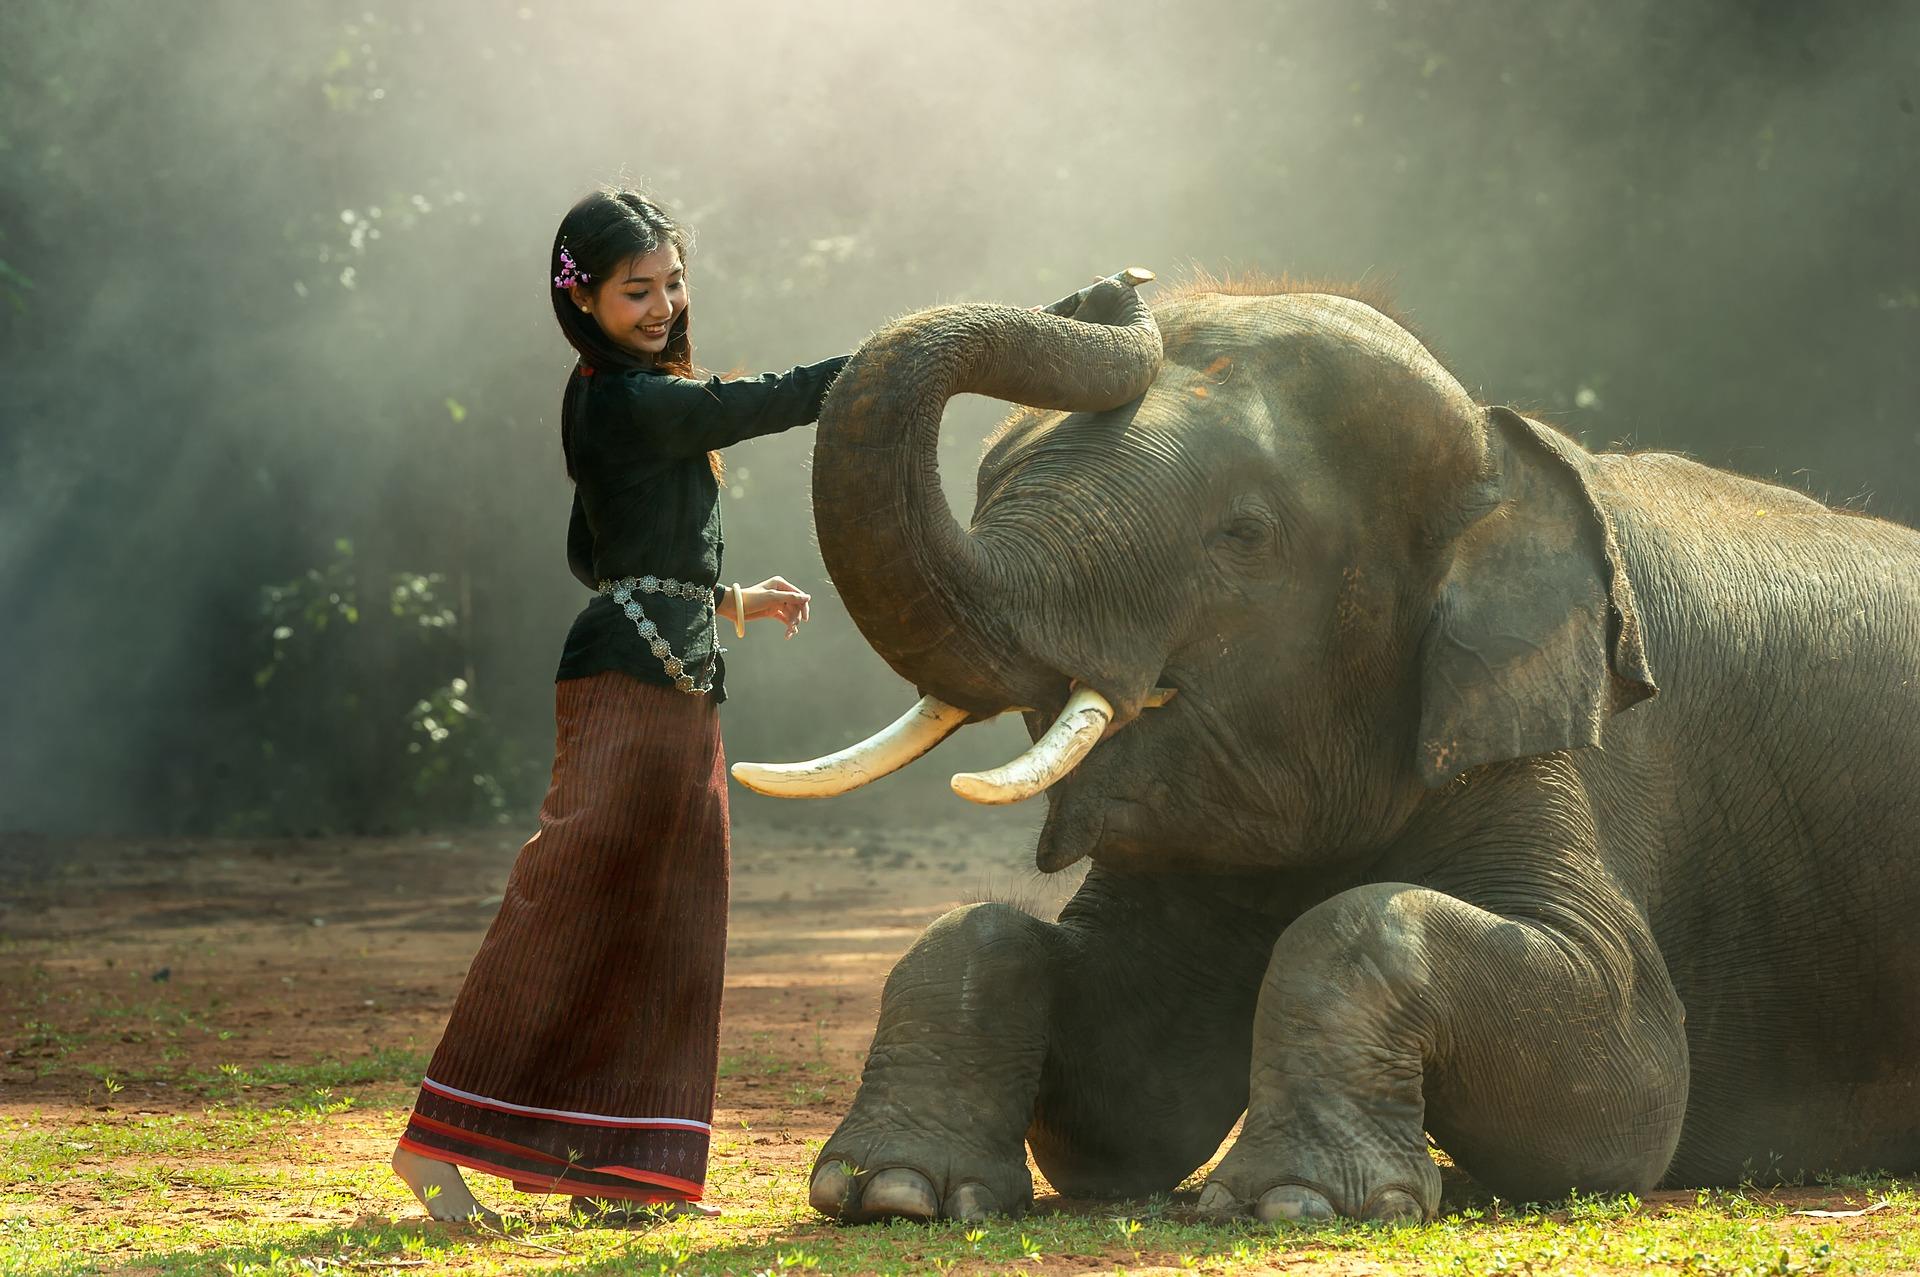 Cambodia Girl with Elephant.jpg